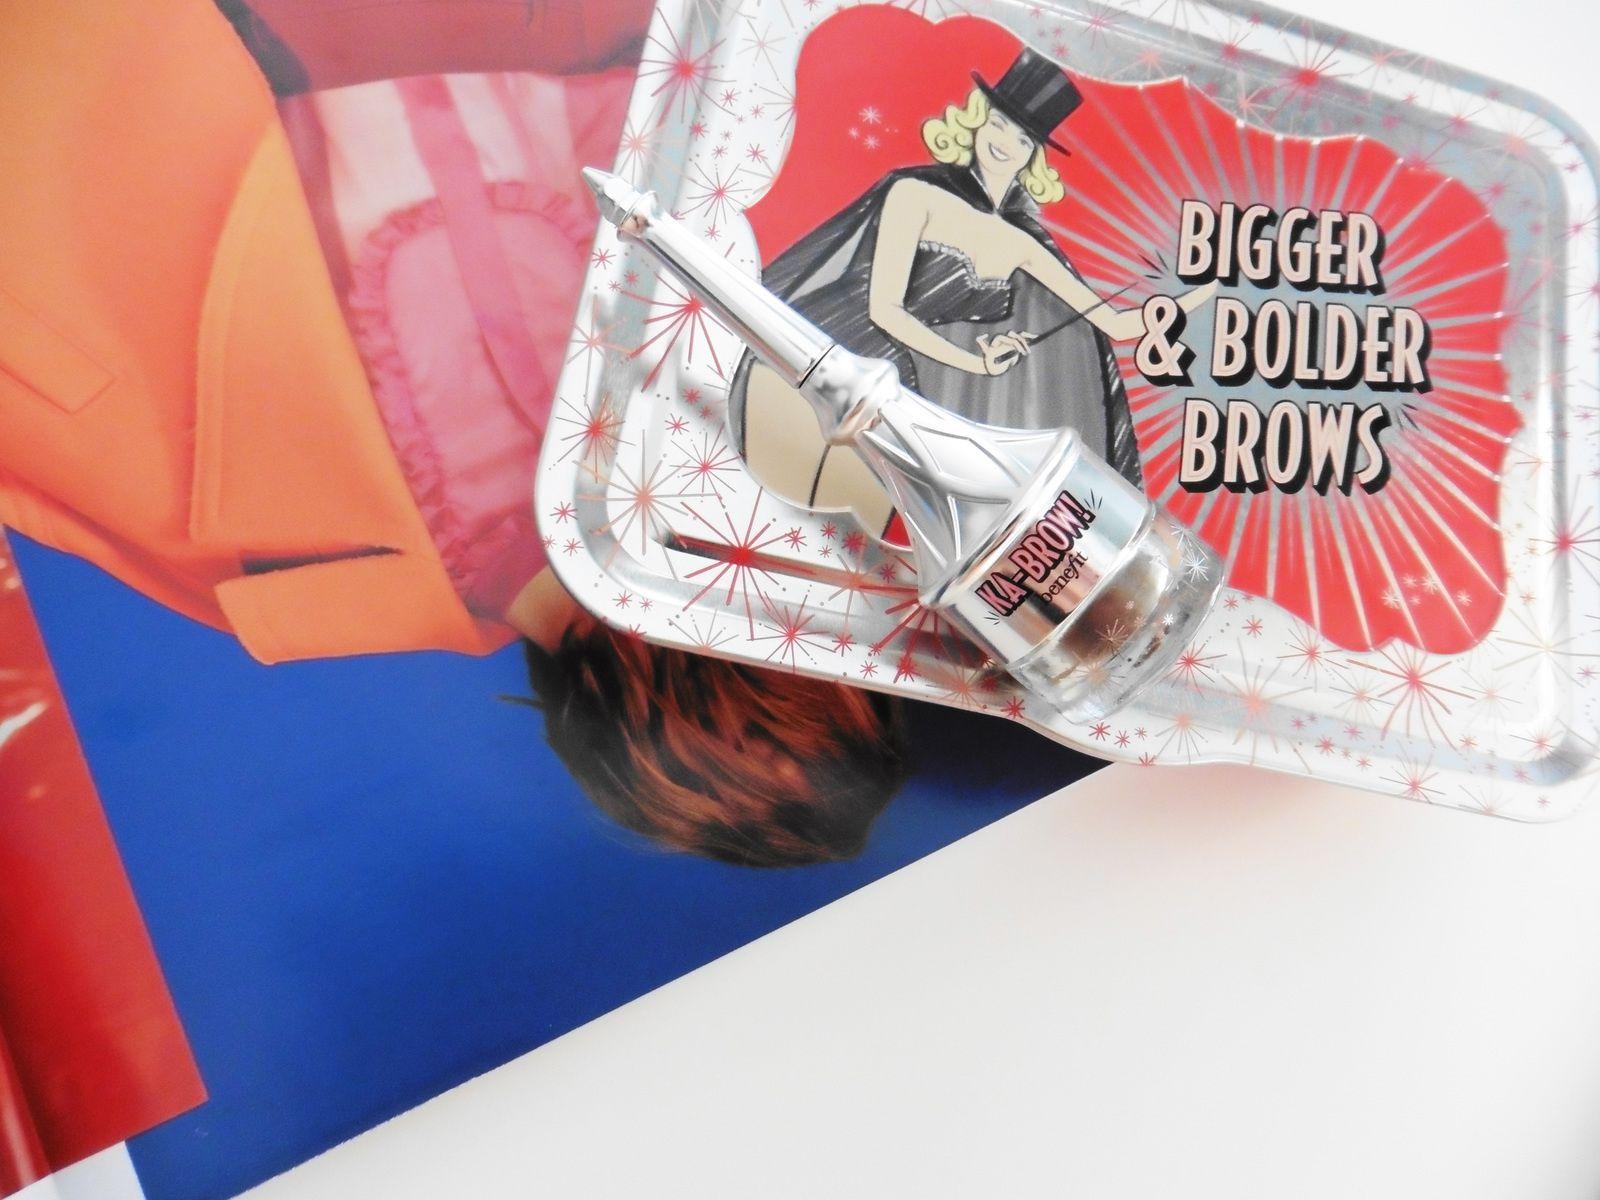 Bigger &amp&#x3B; Bolder Brows by Benefit